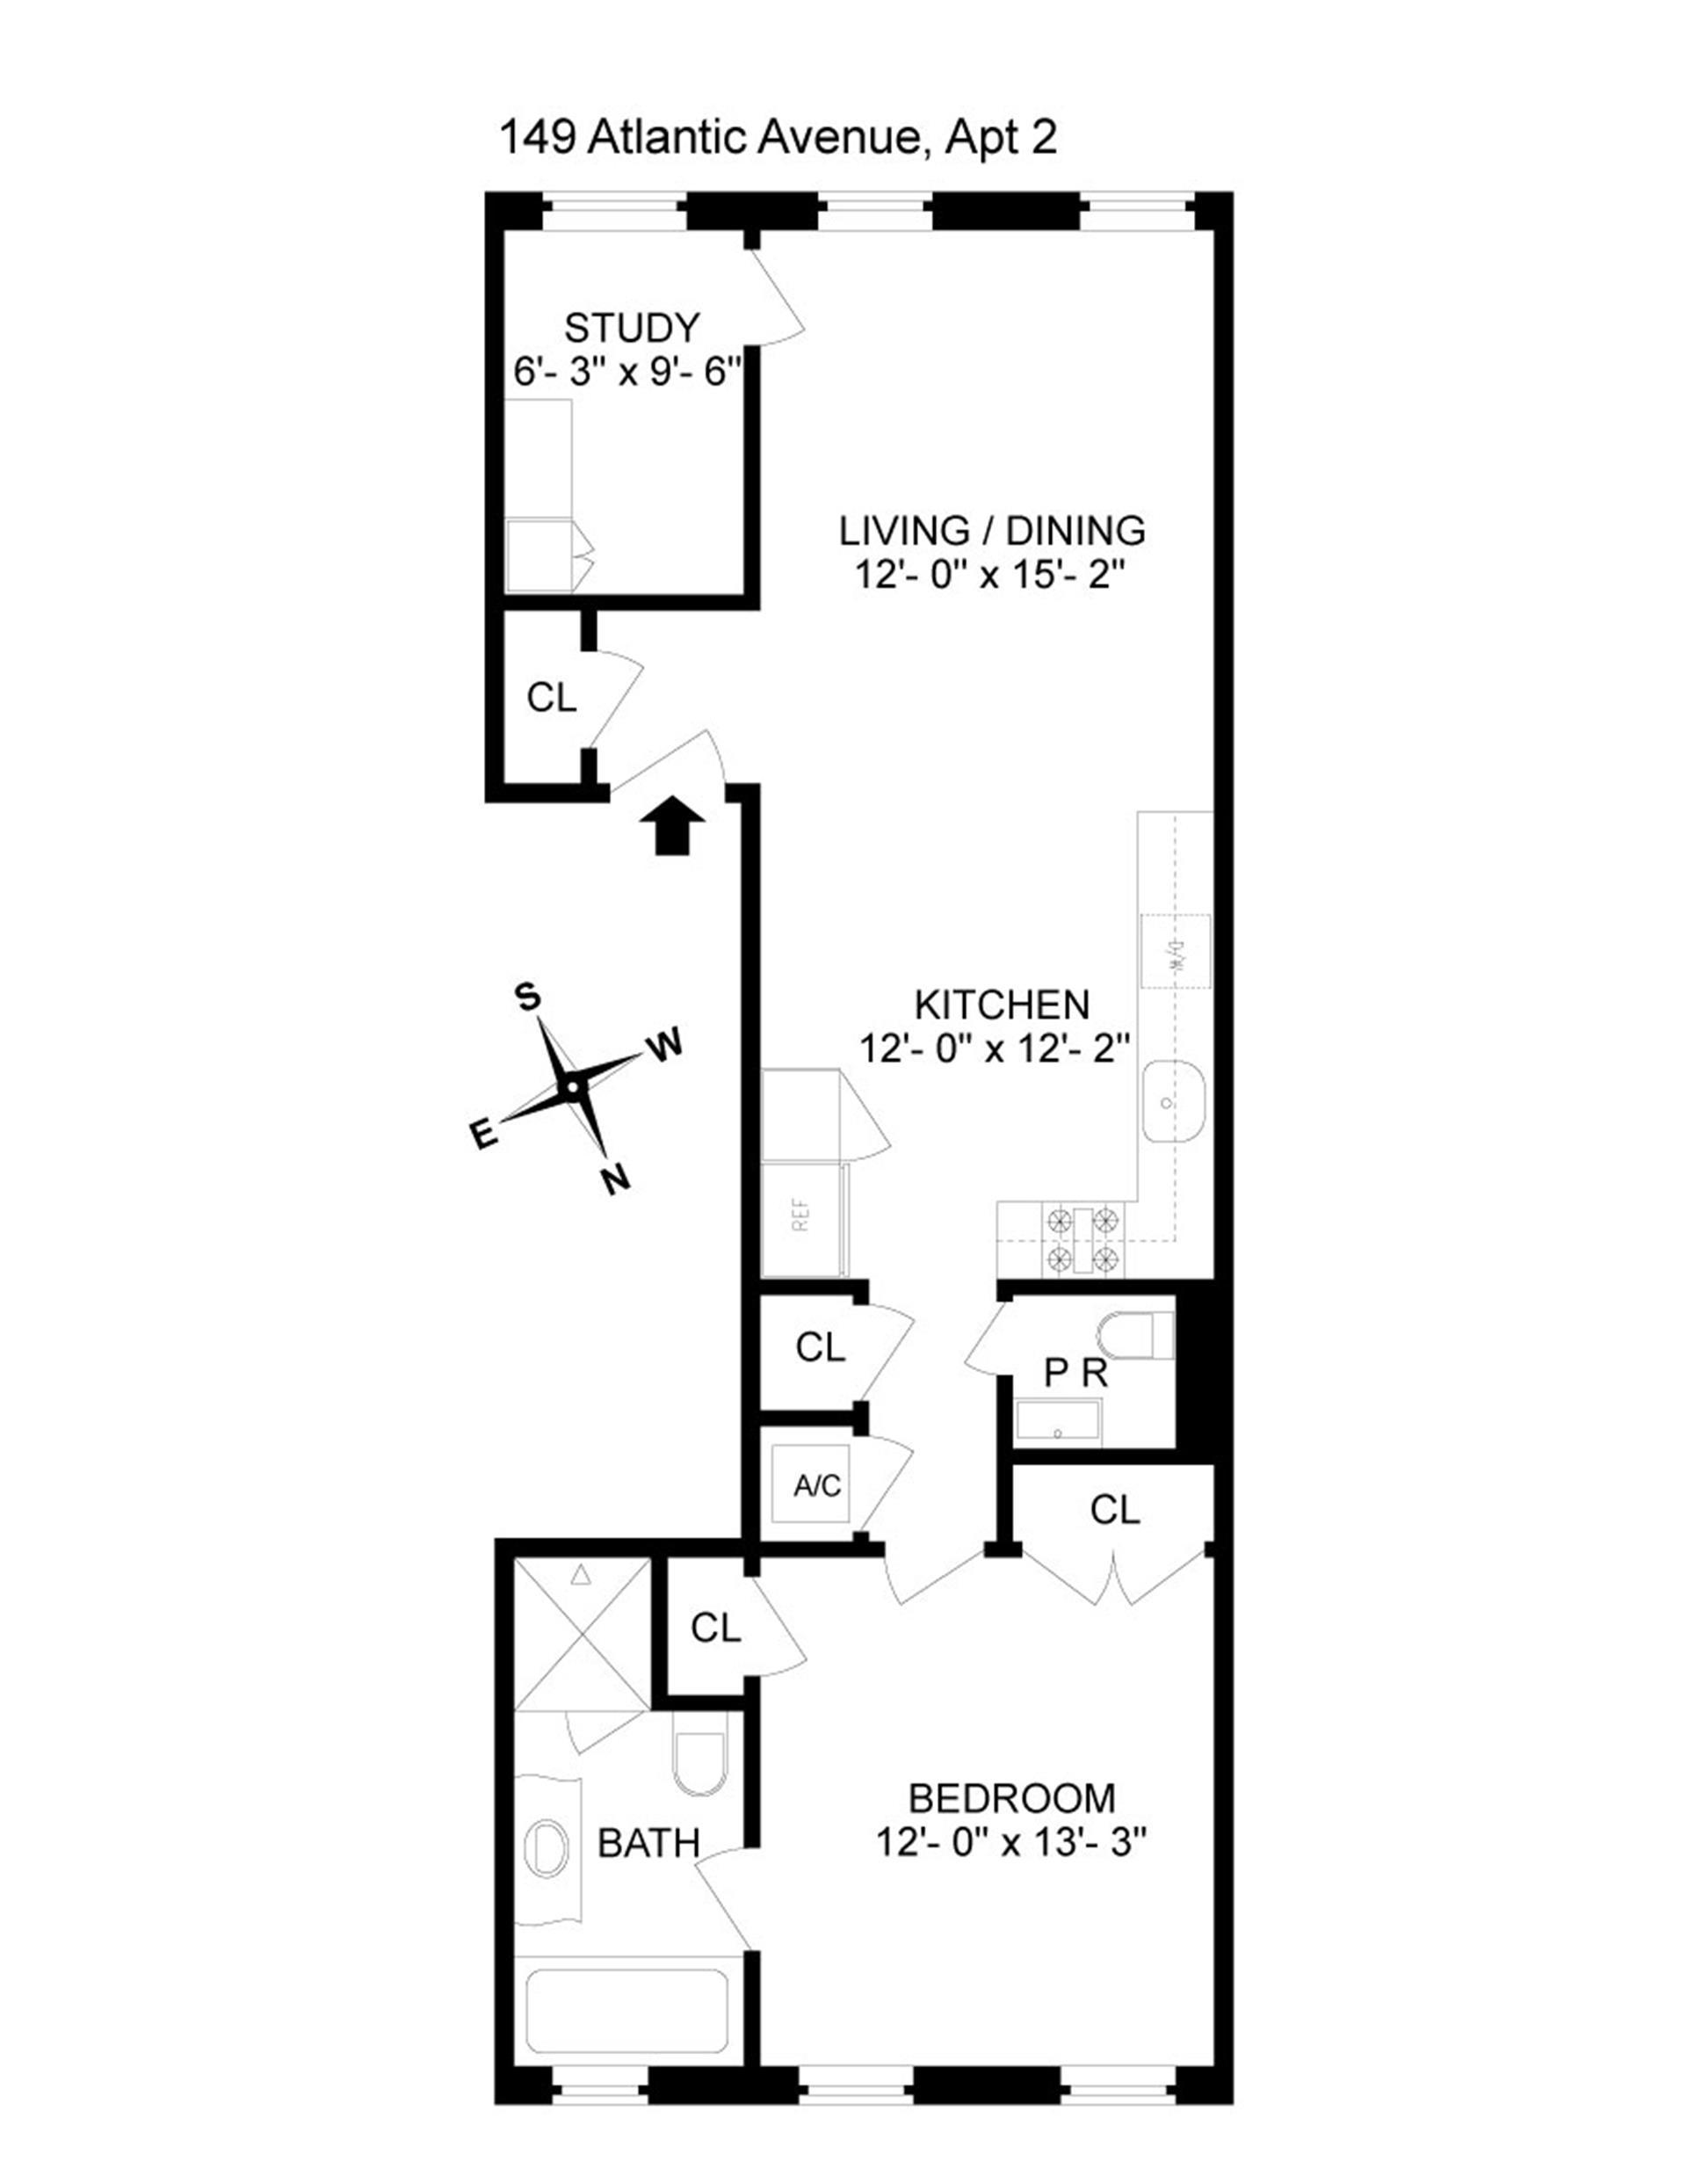 Floor plan of 149 Atlantic Avenue, 2 - Brooklyn Heights, New York